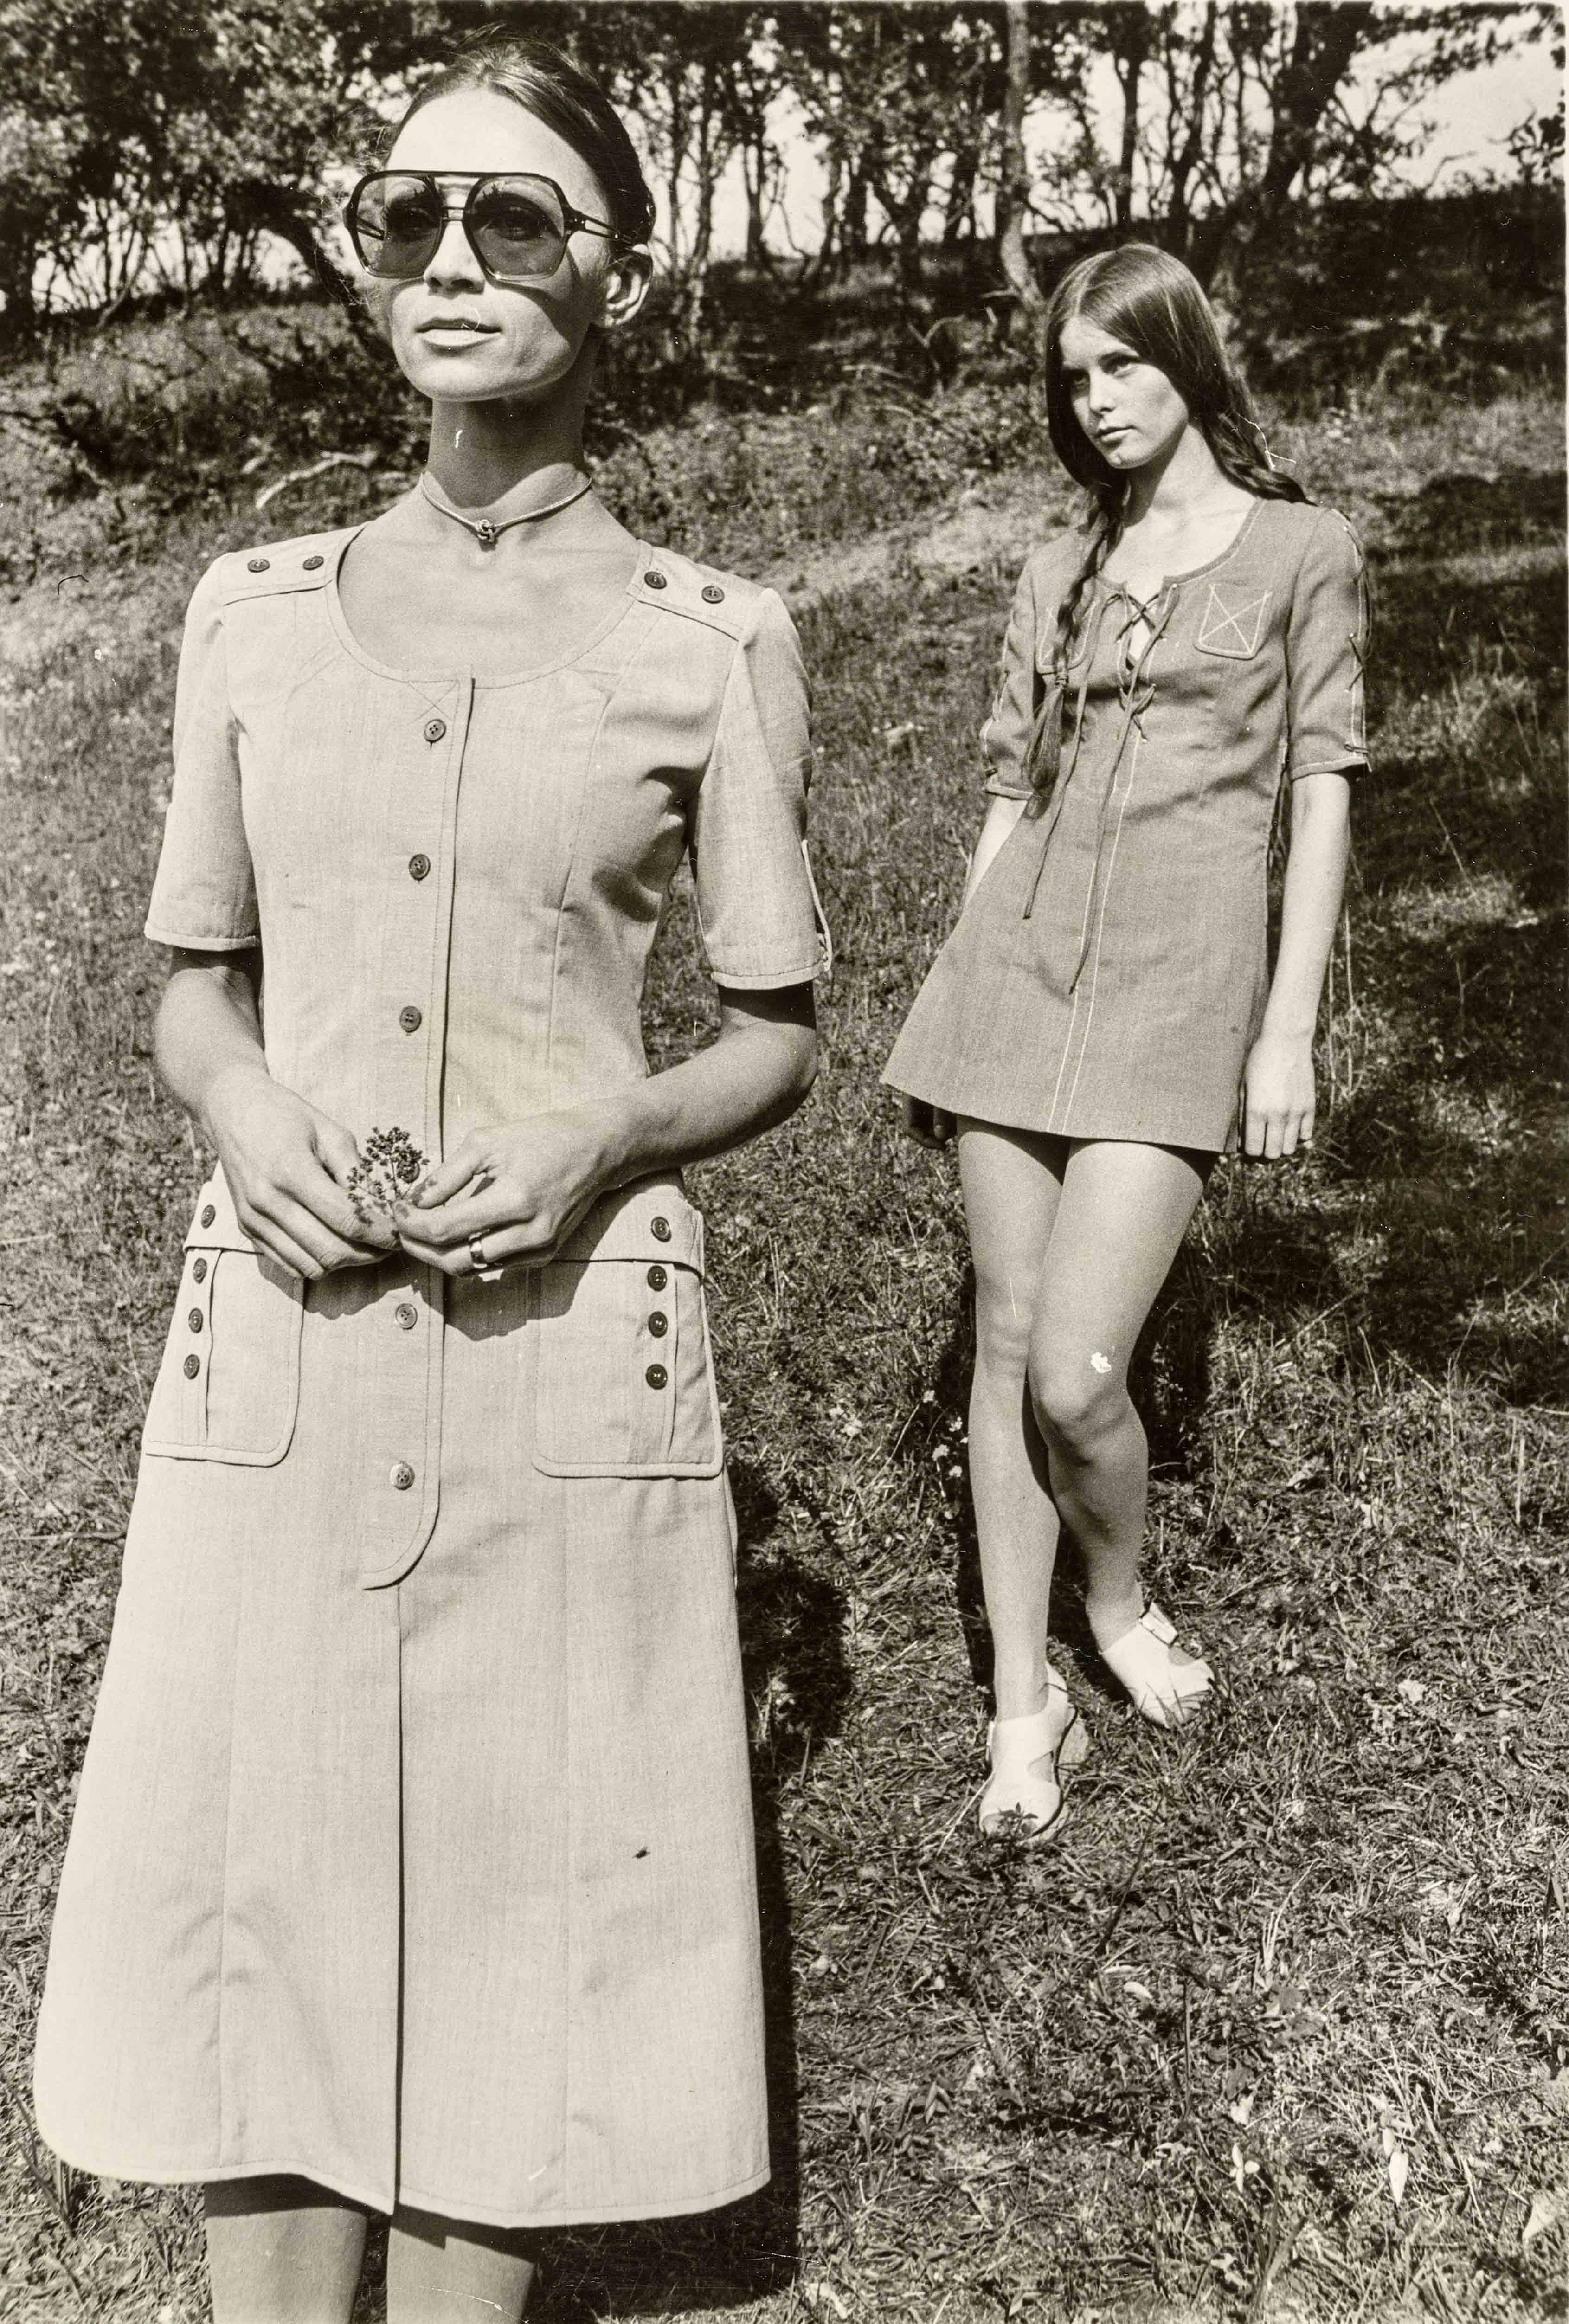 Summer dresses   vintage print   15,7 x 11,8 in   design: Dorothee Brandt, production: PGH 'Eintracht'   'Sibylle', issue 2, 1972 Galerie Berinson, Berlin